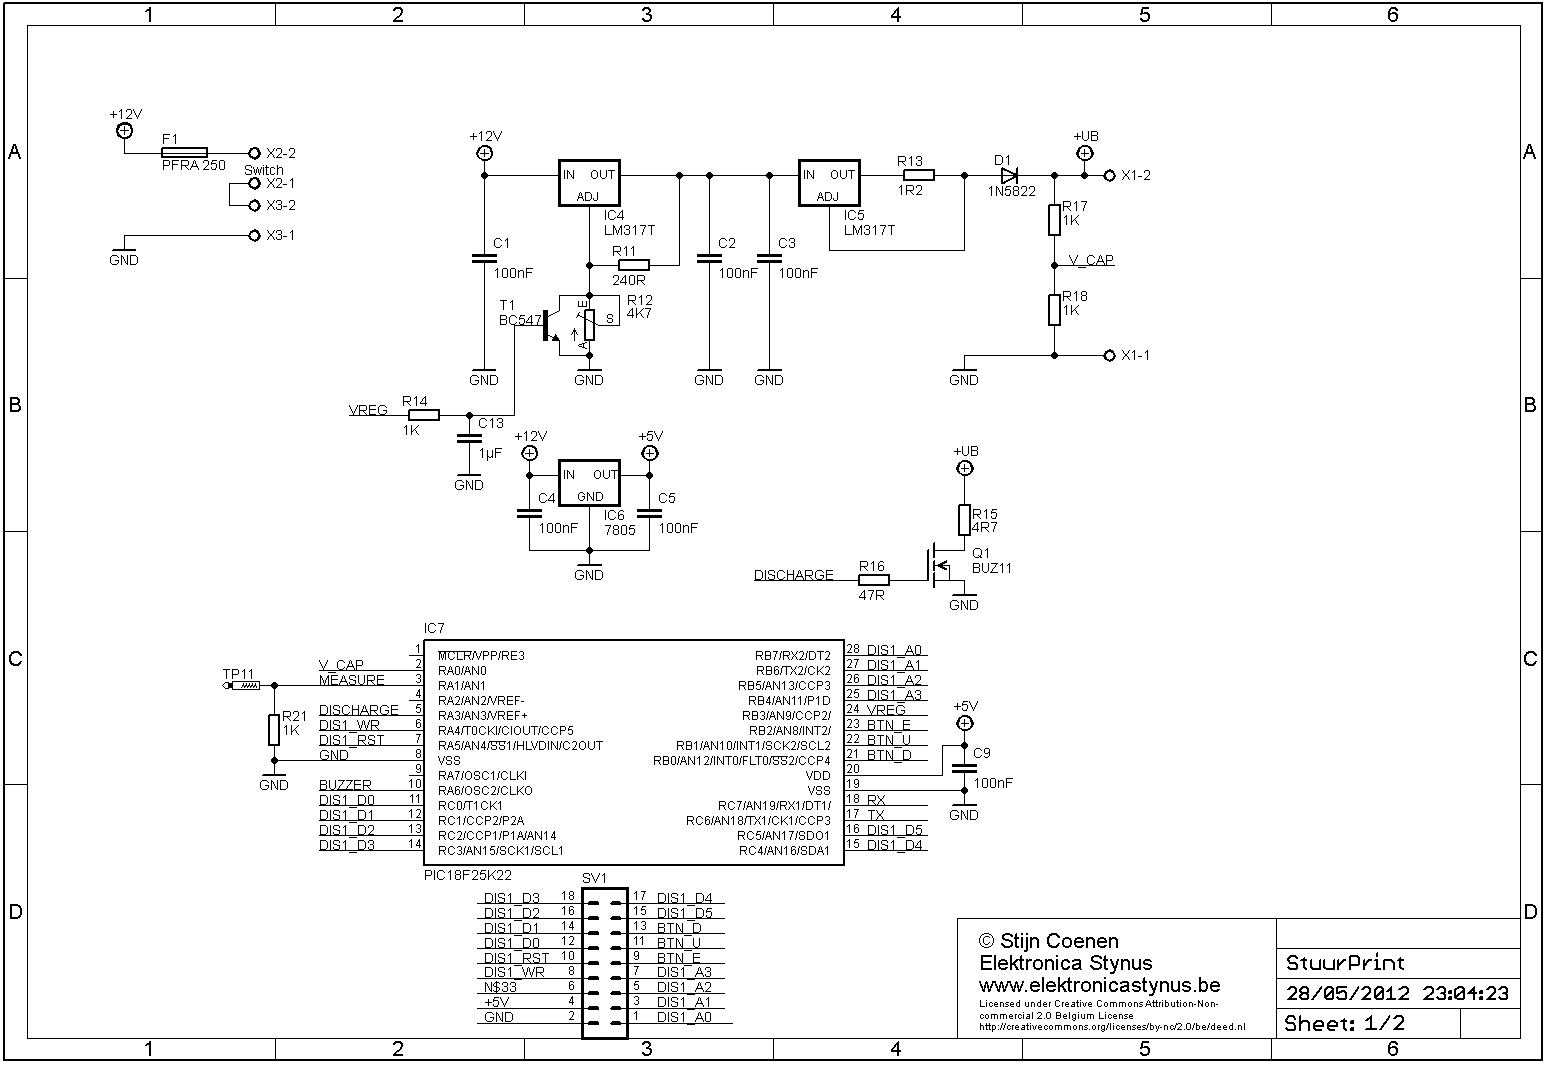 http://image.elektronicastynus.be/82/Schema_Stuurprint_1.png